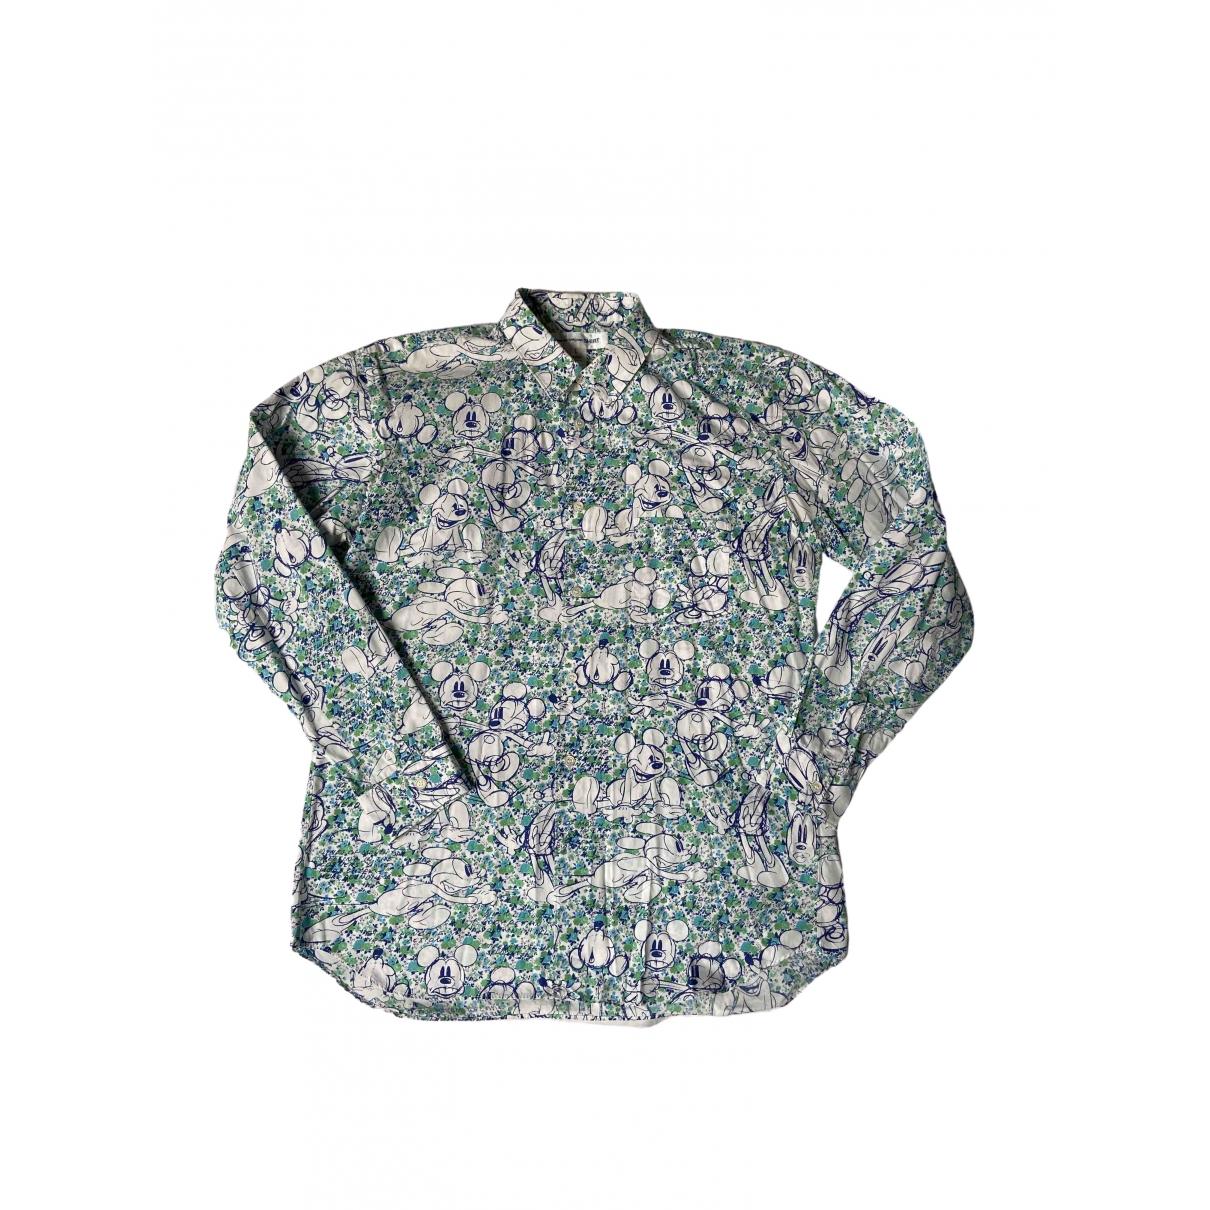 Comme Des Garcons \N Green Cotton Shirts for Men L International